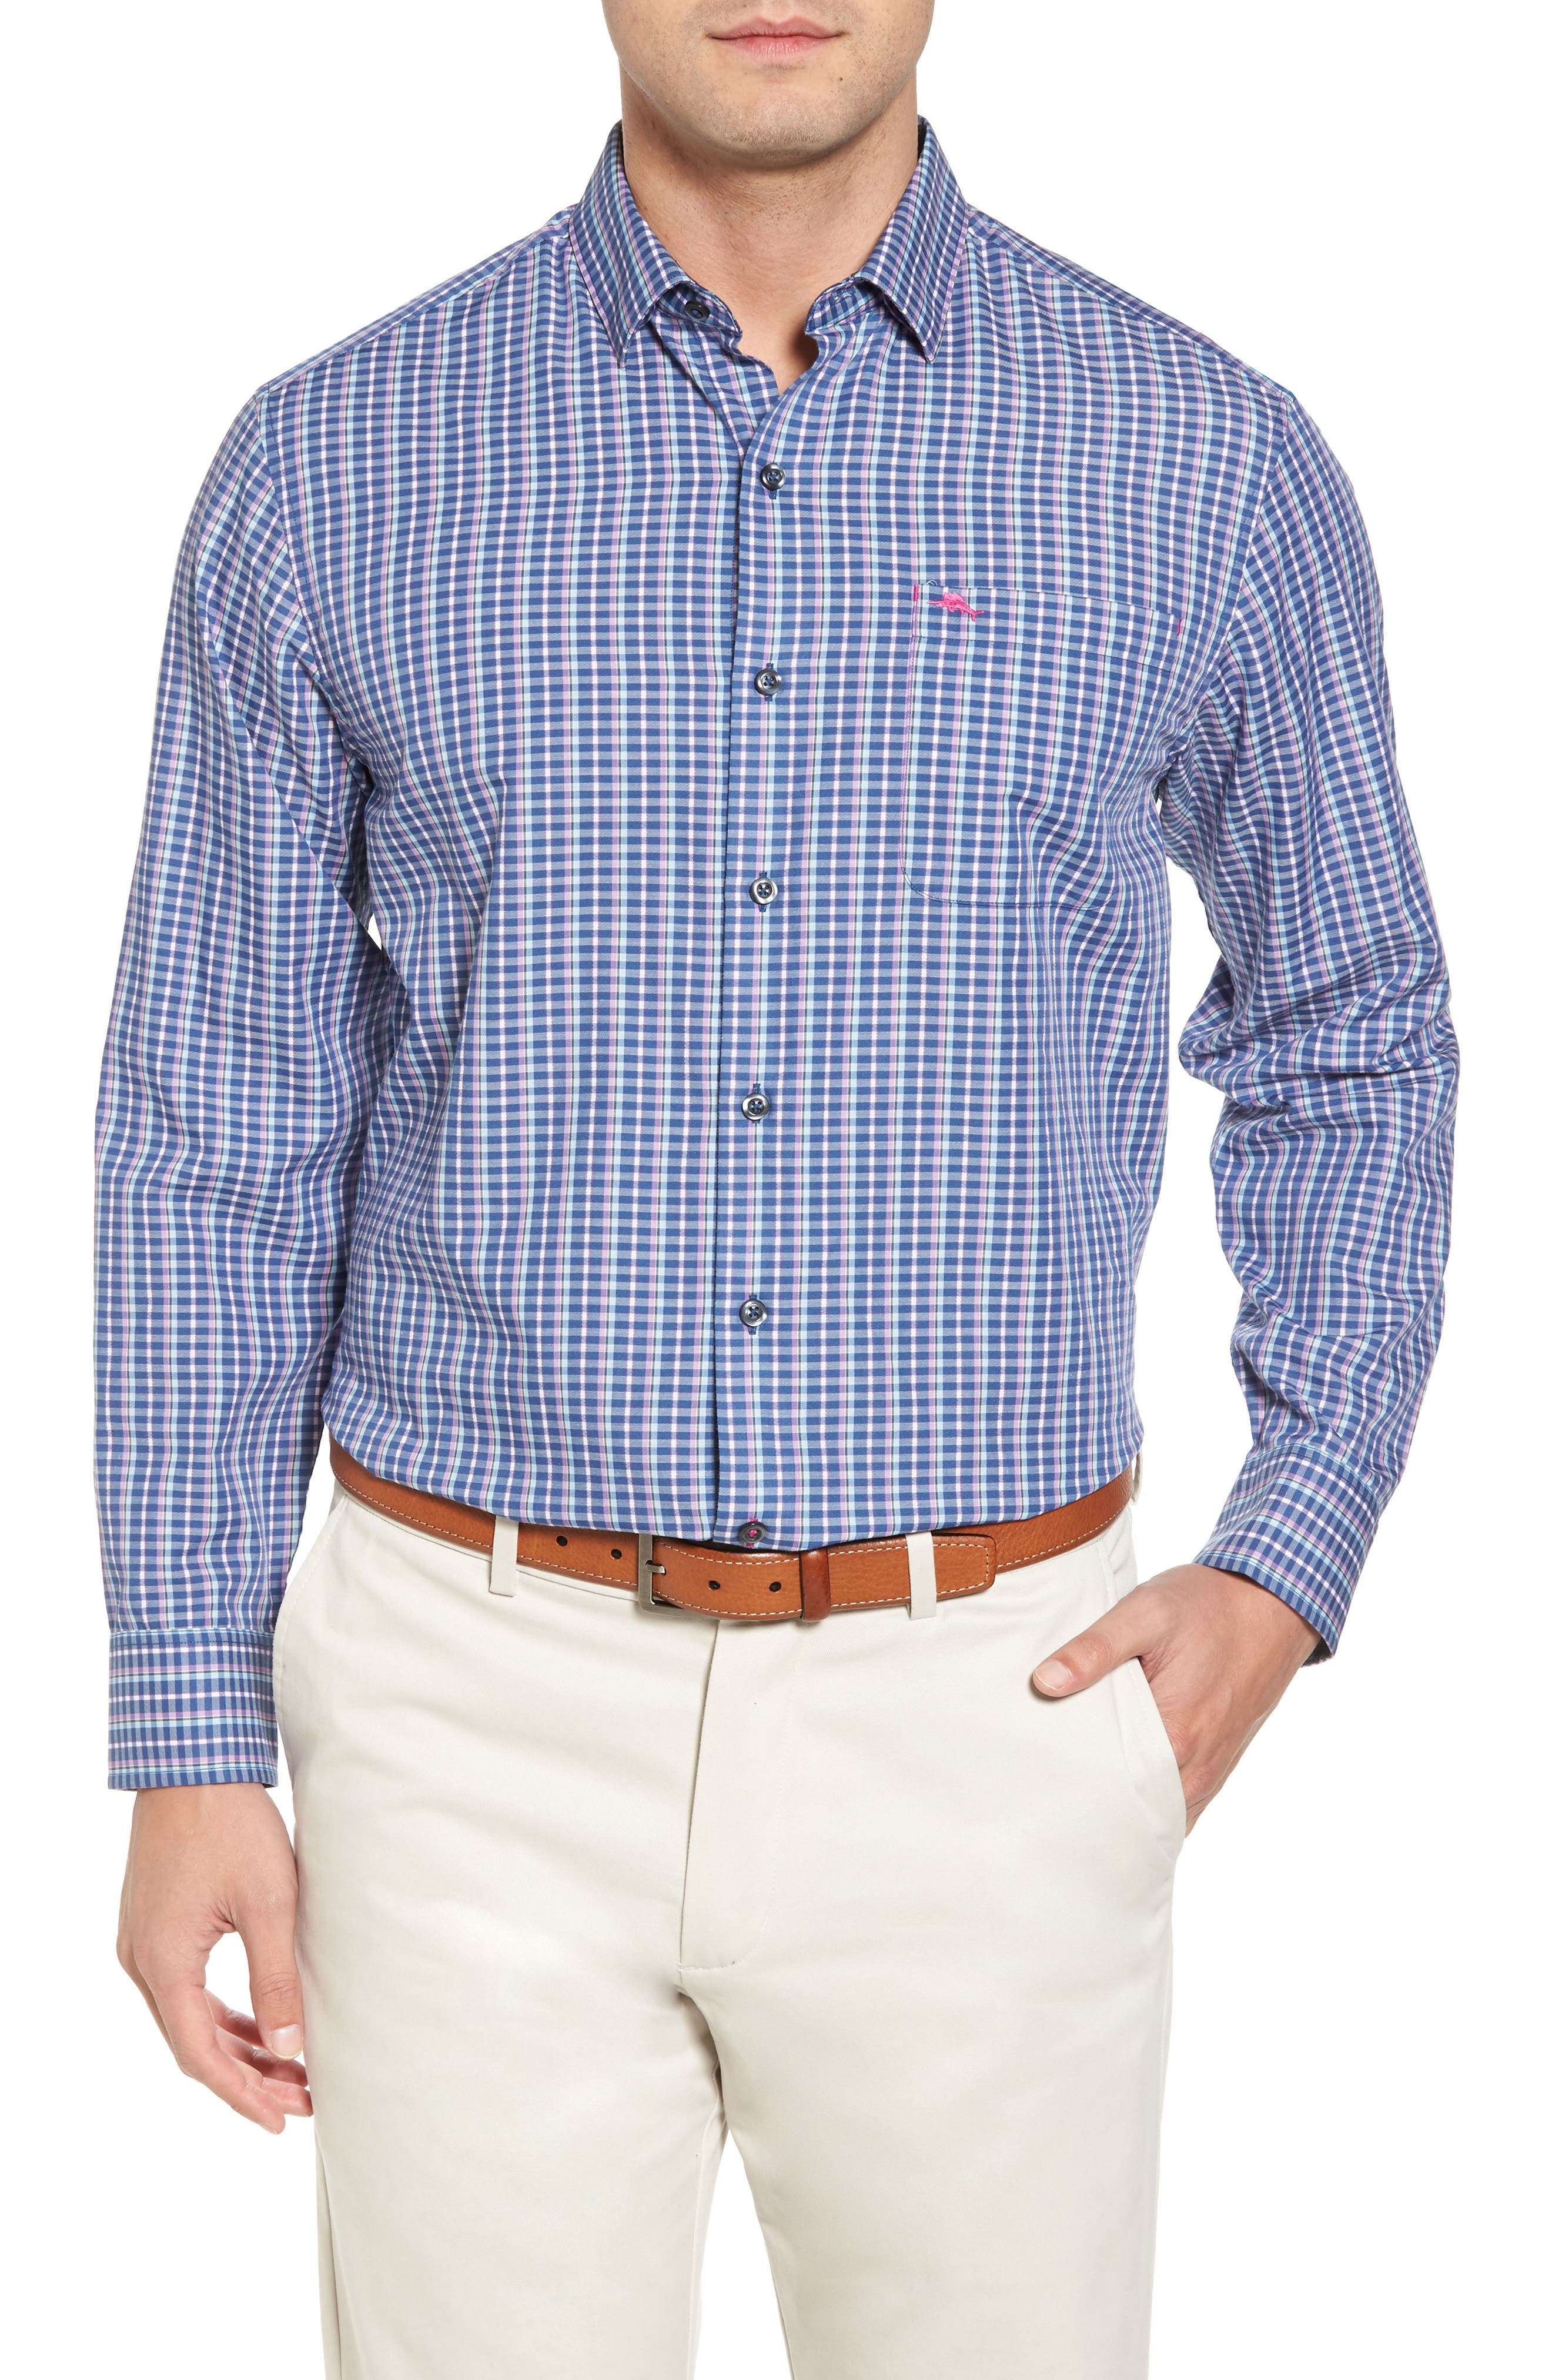 Main Image - Tommy Bahama Cypress Cove Classic Fit Plaid Sport Shirt